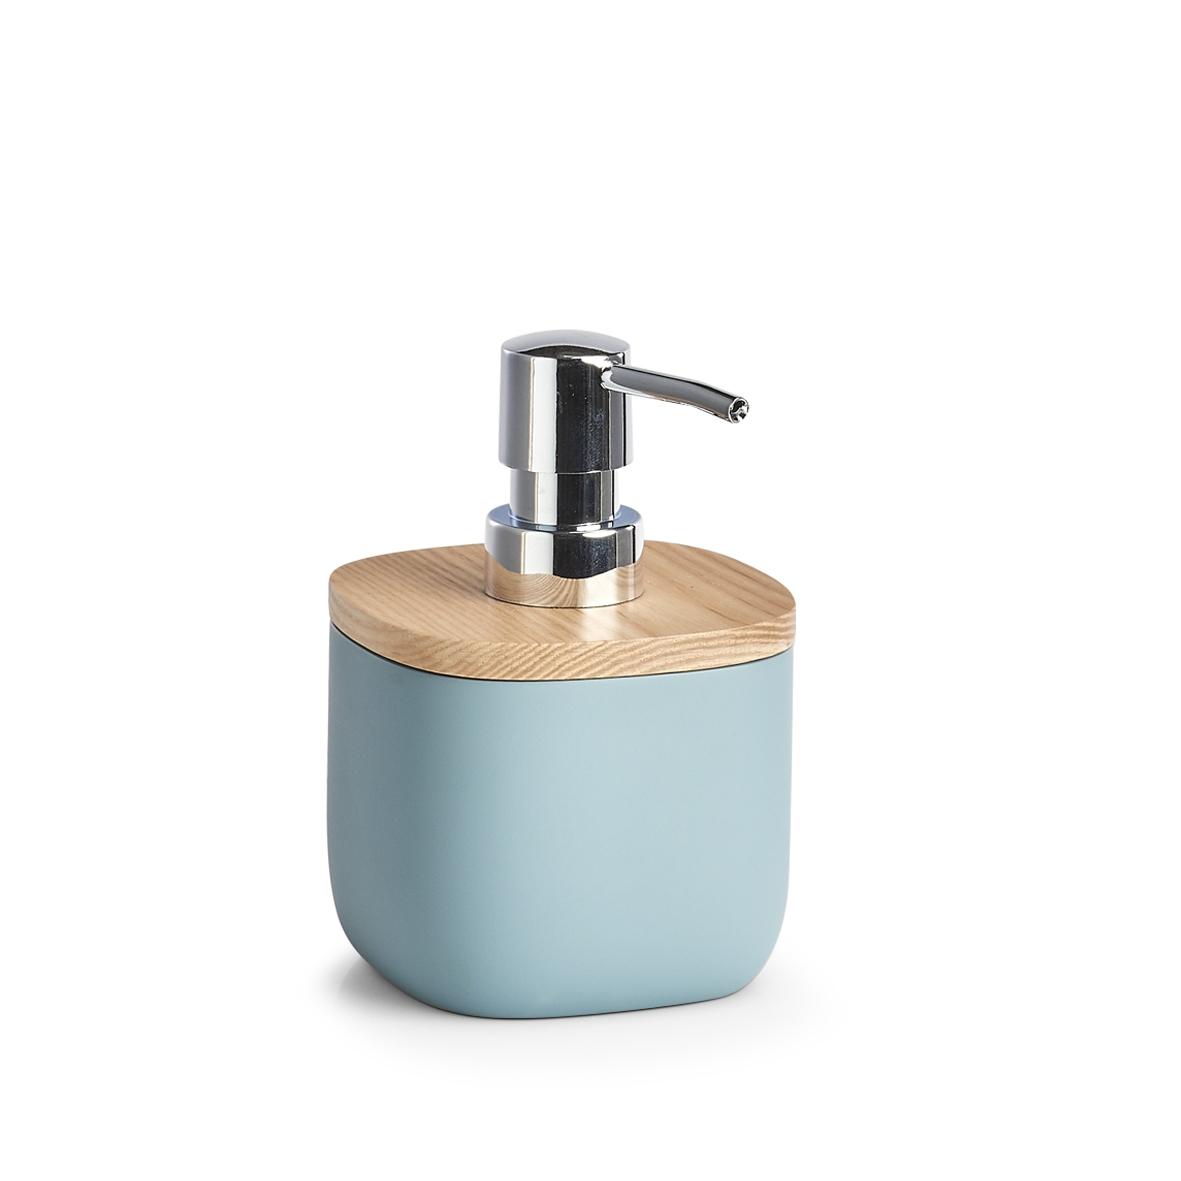 Poza Dozator pentru sapun din polirasina, Ash Wood Albastru, L9,6xl9,6xH14 cm